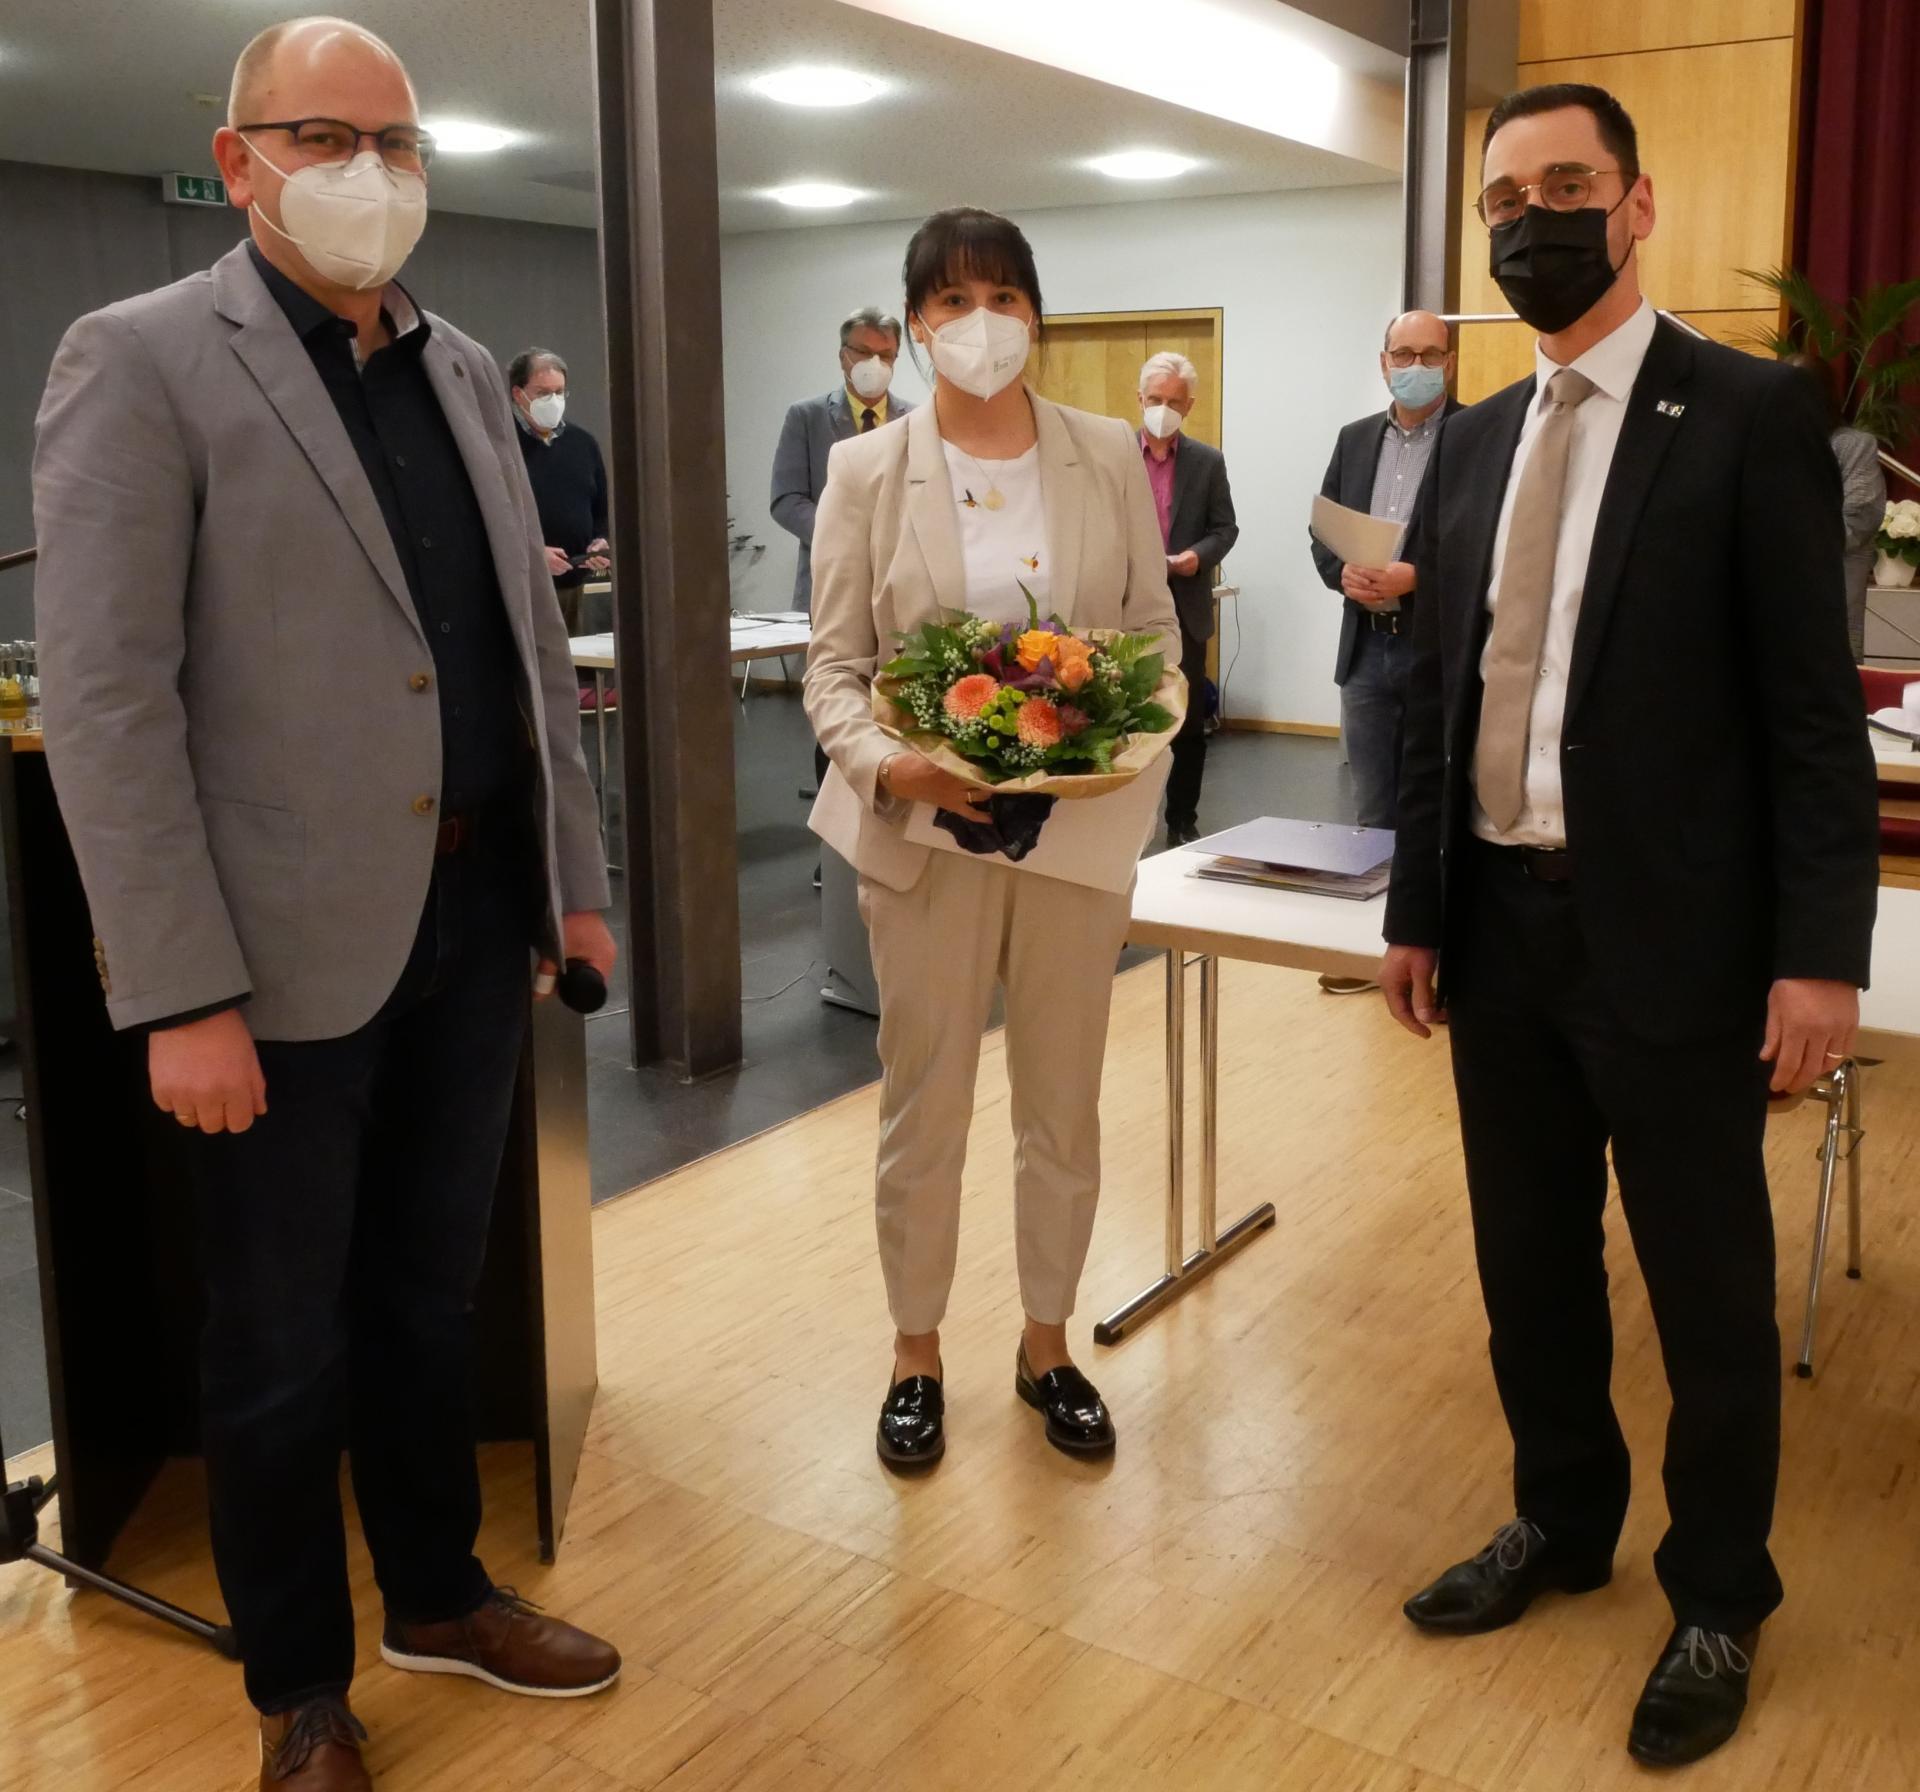 Marco Herbert - Vorsitzender der Gemeindevertretung, Kathrina Hosenfeld - Erste Beigeordnete, Florian Fritzsch - Bürgermeister